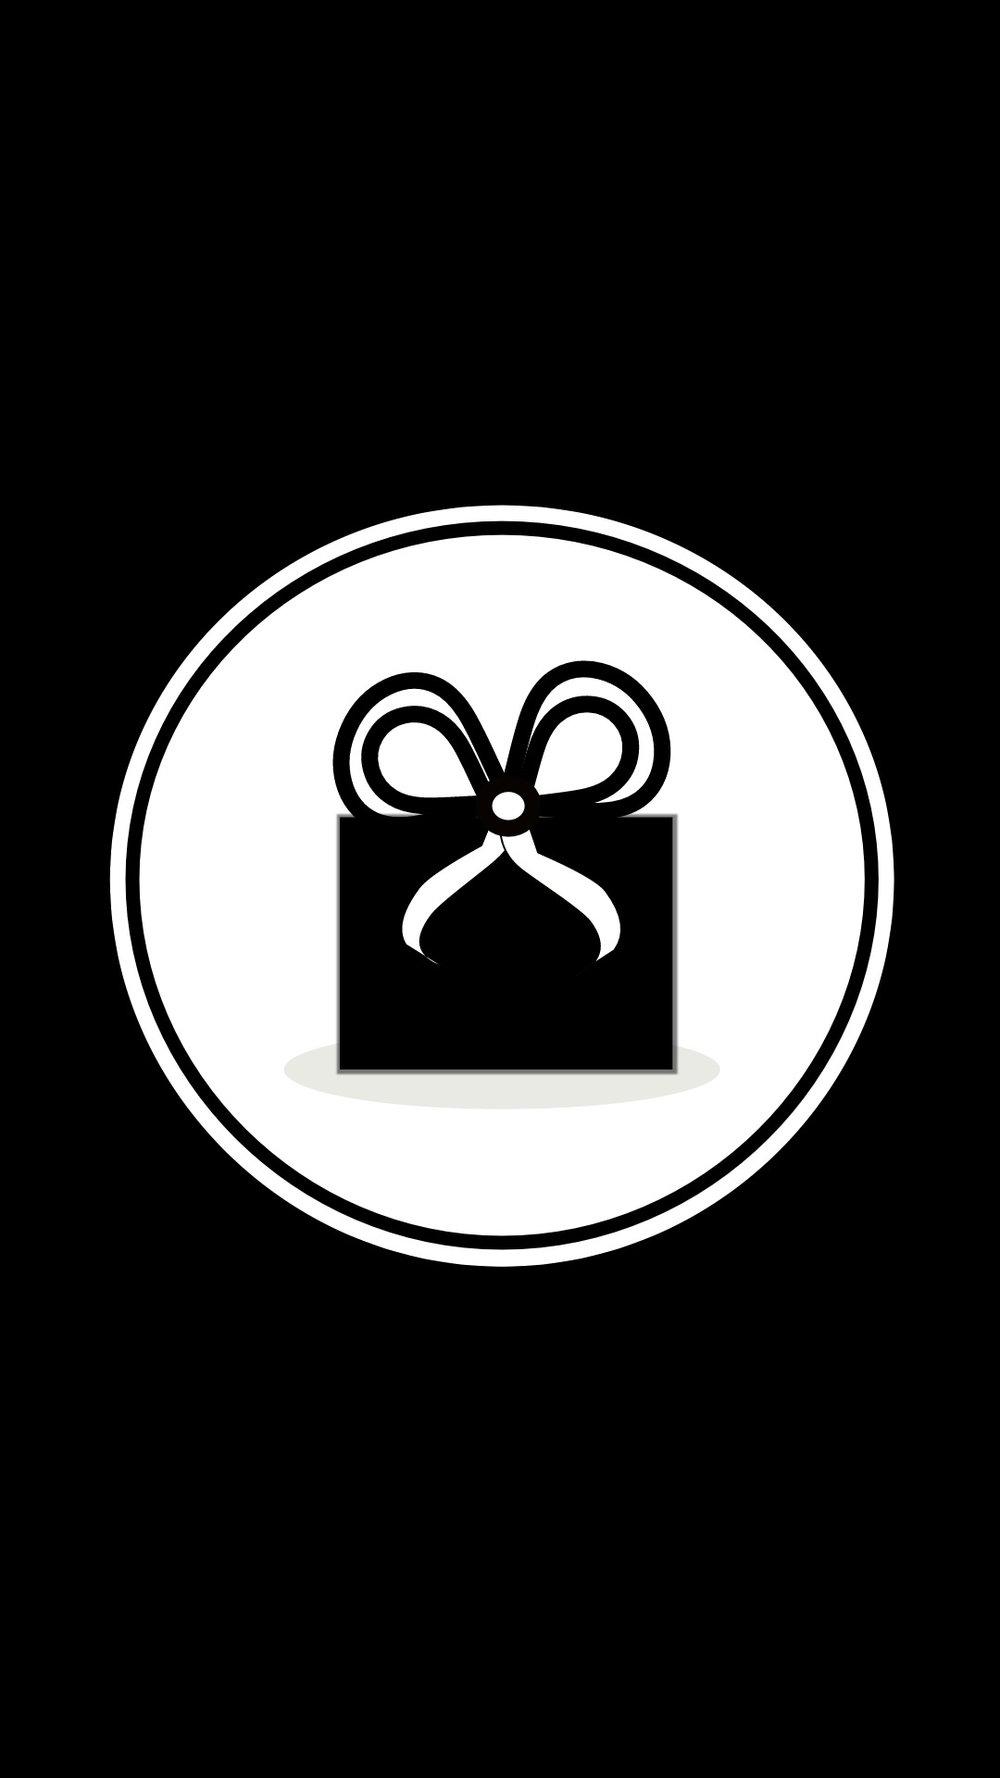 Instagram-cover-box-black-lotnotes.com.jpg